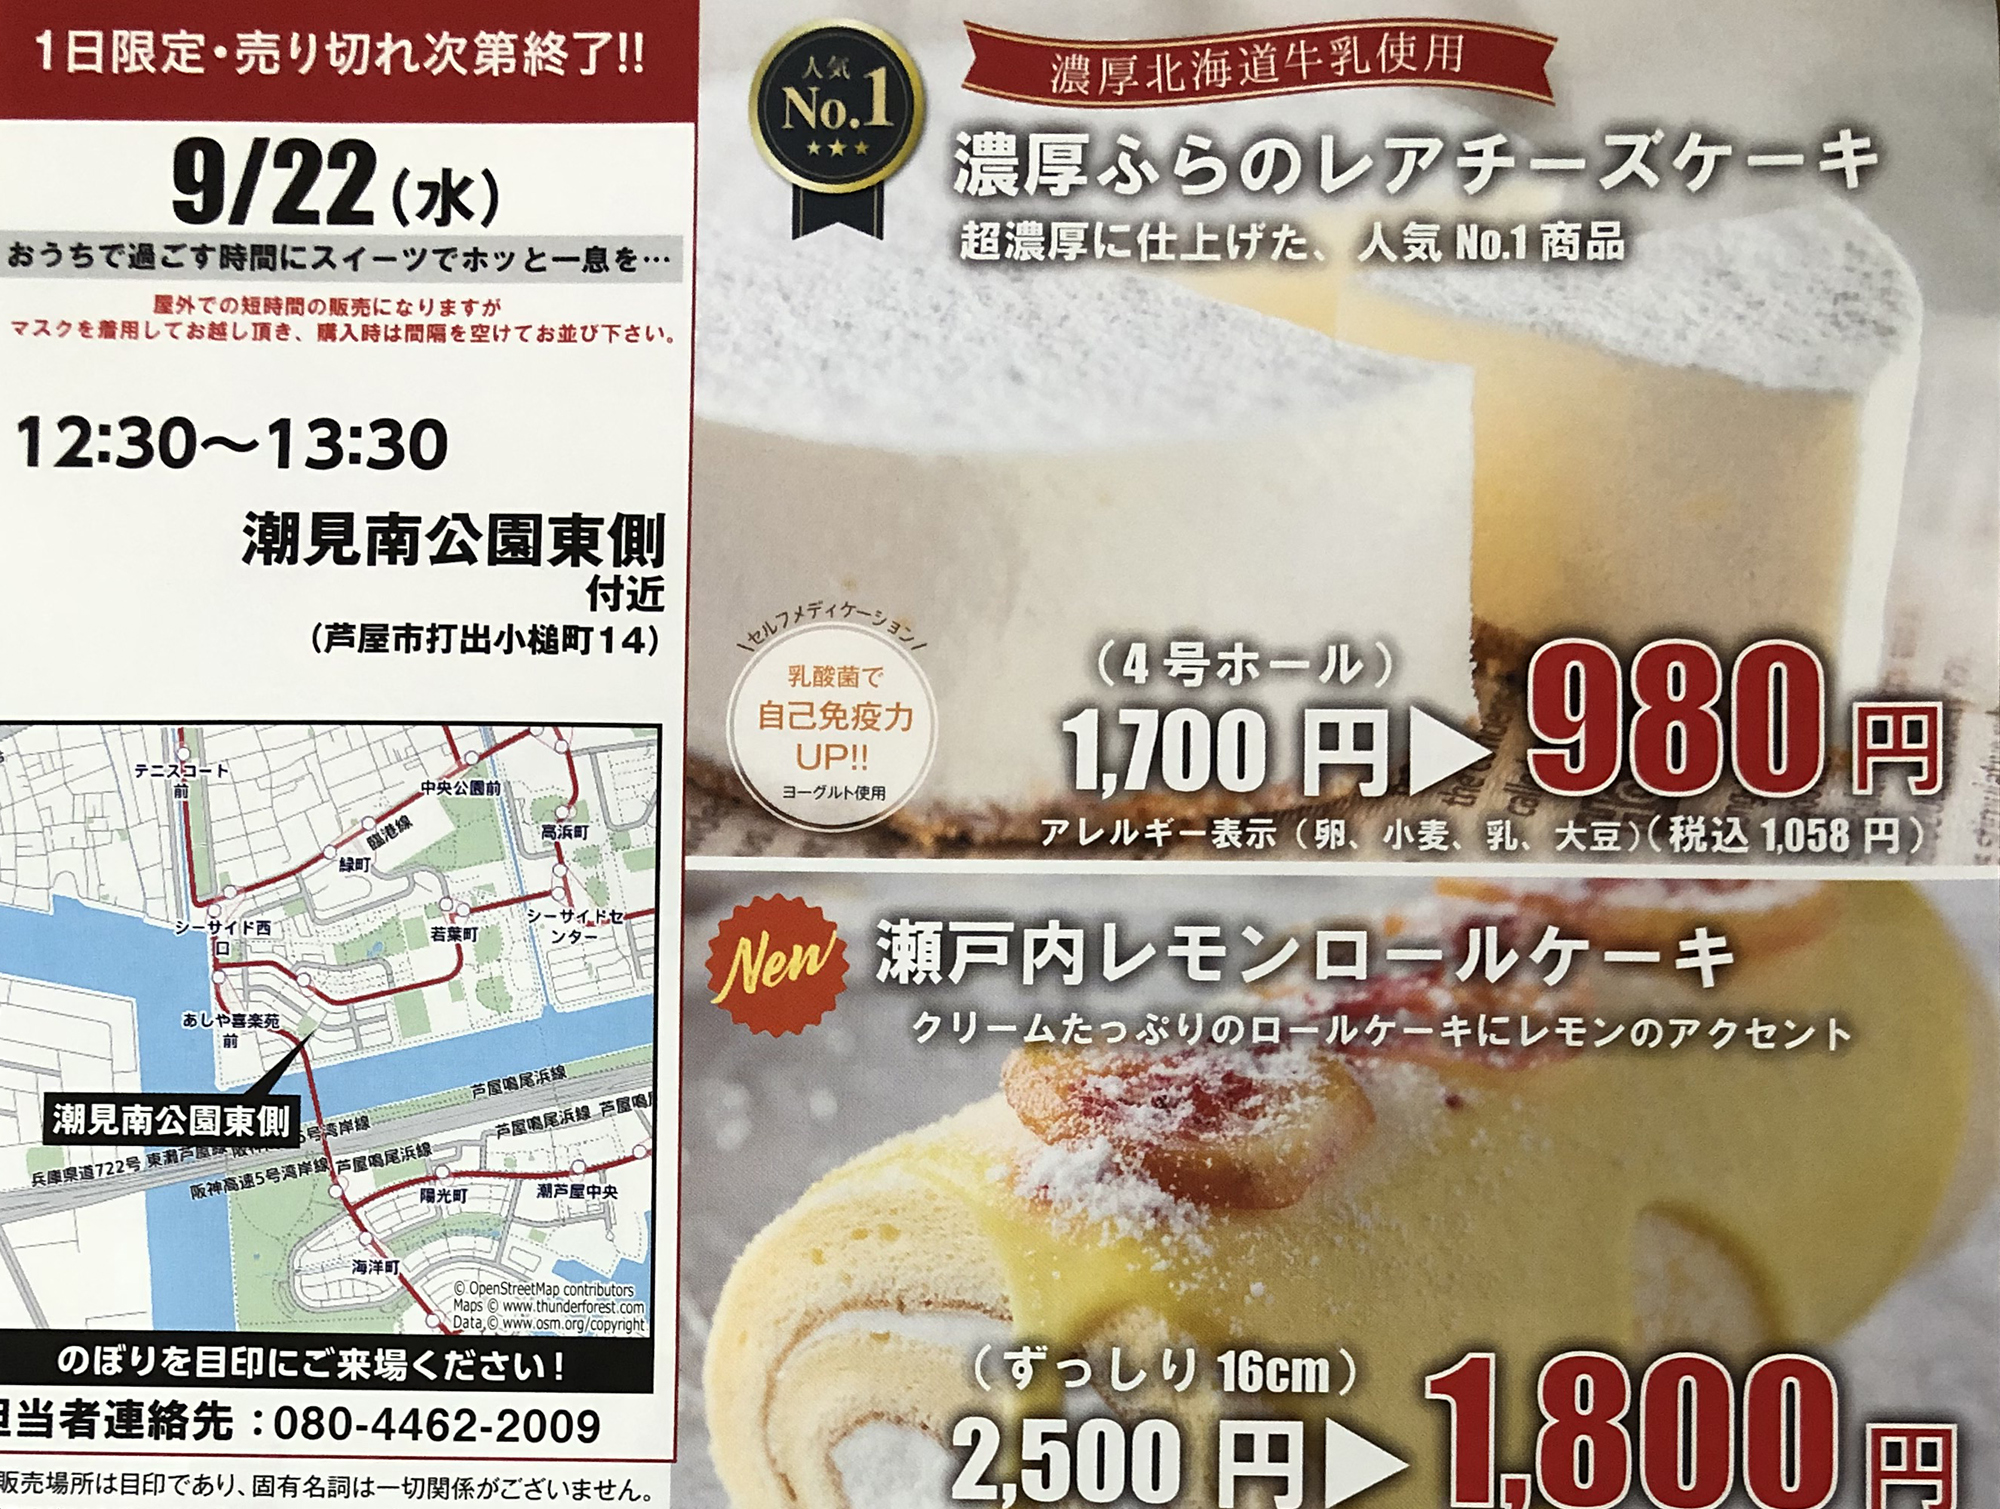 2021年9月22日 1時間限定洋菓子の移動販売